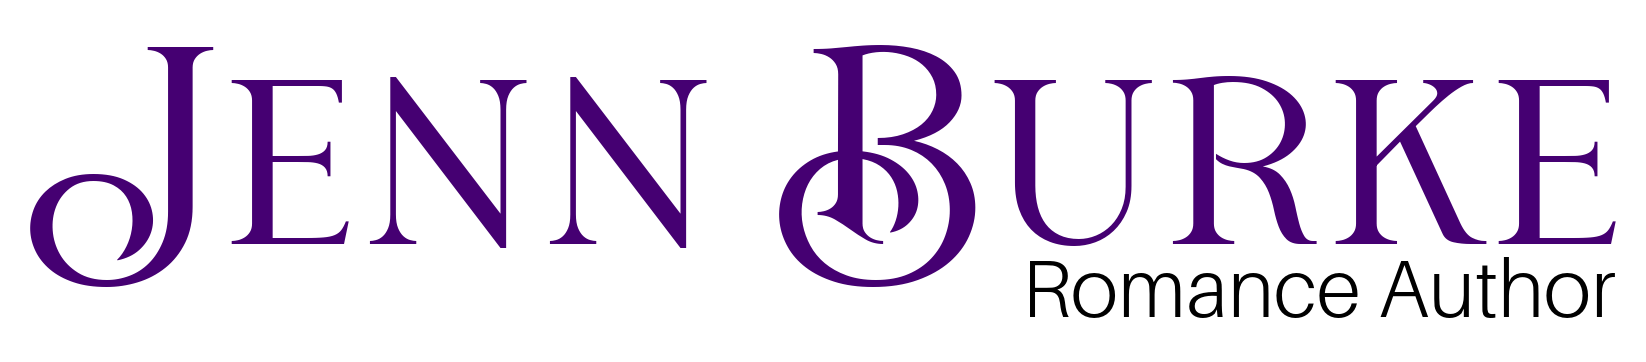 Jenn Burke Romance Author